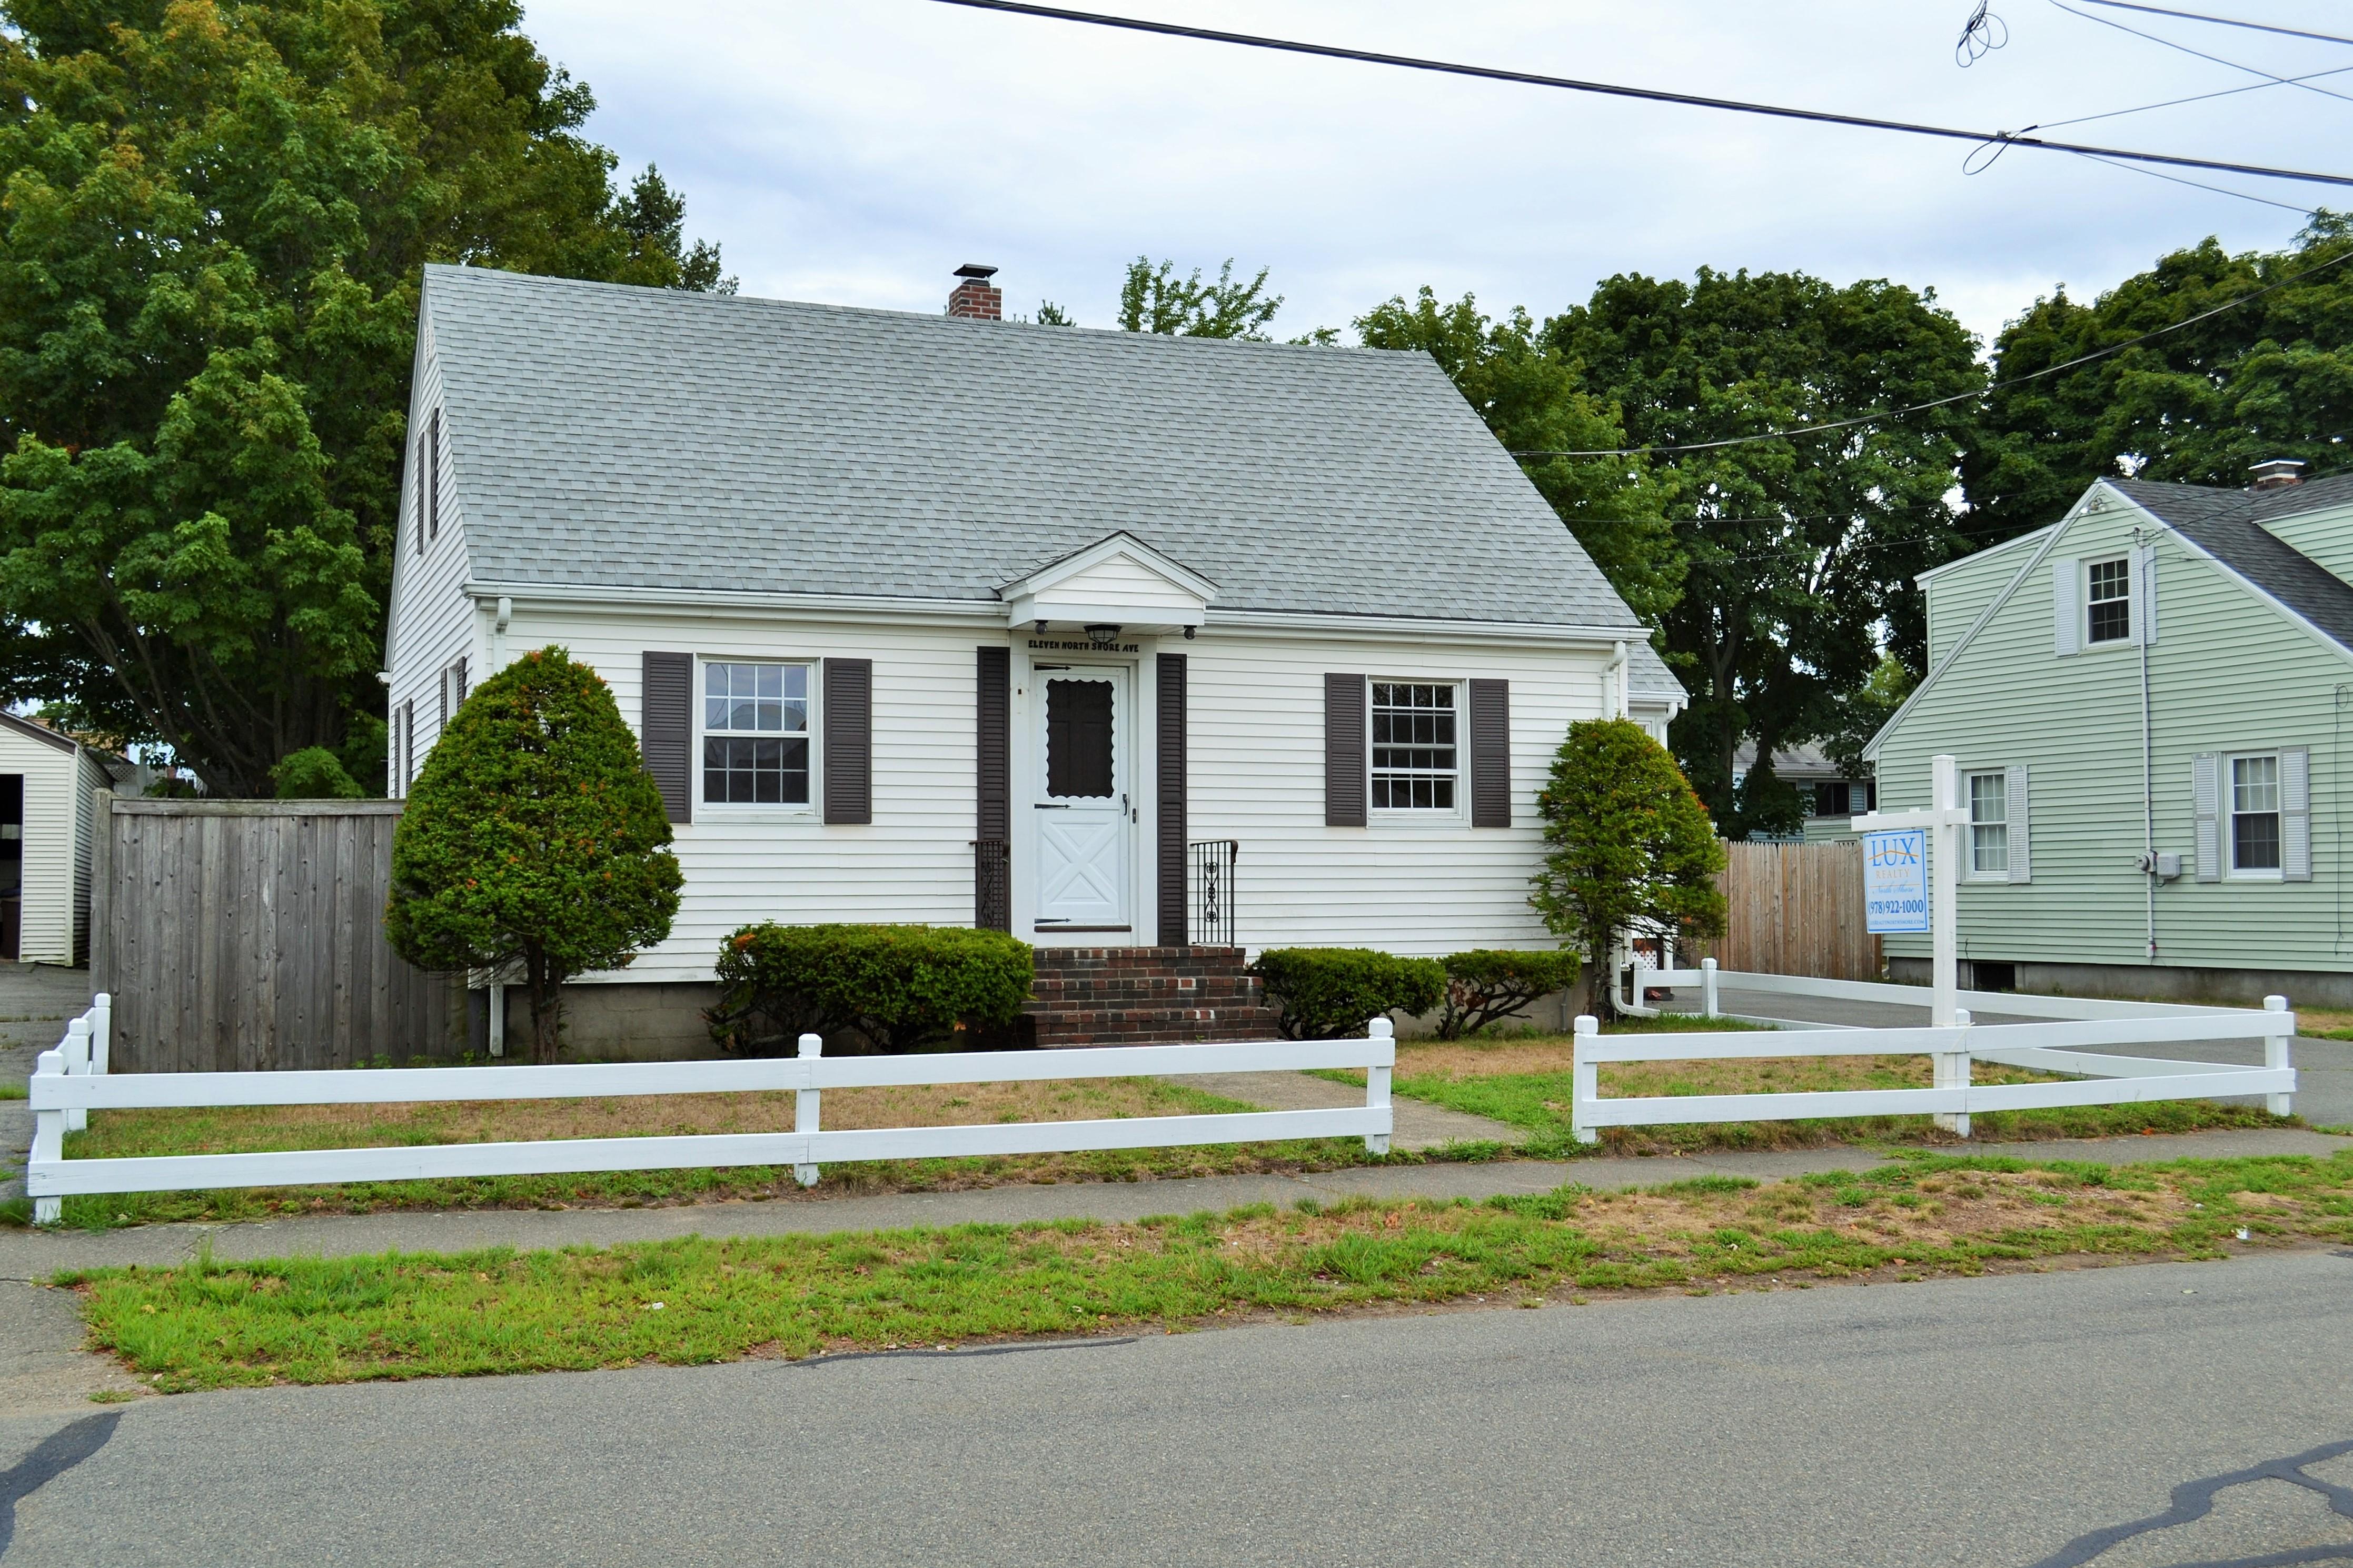 Danvers- Classic Cape Cod Home